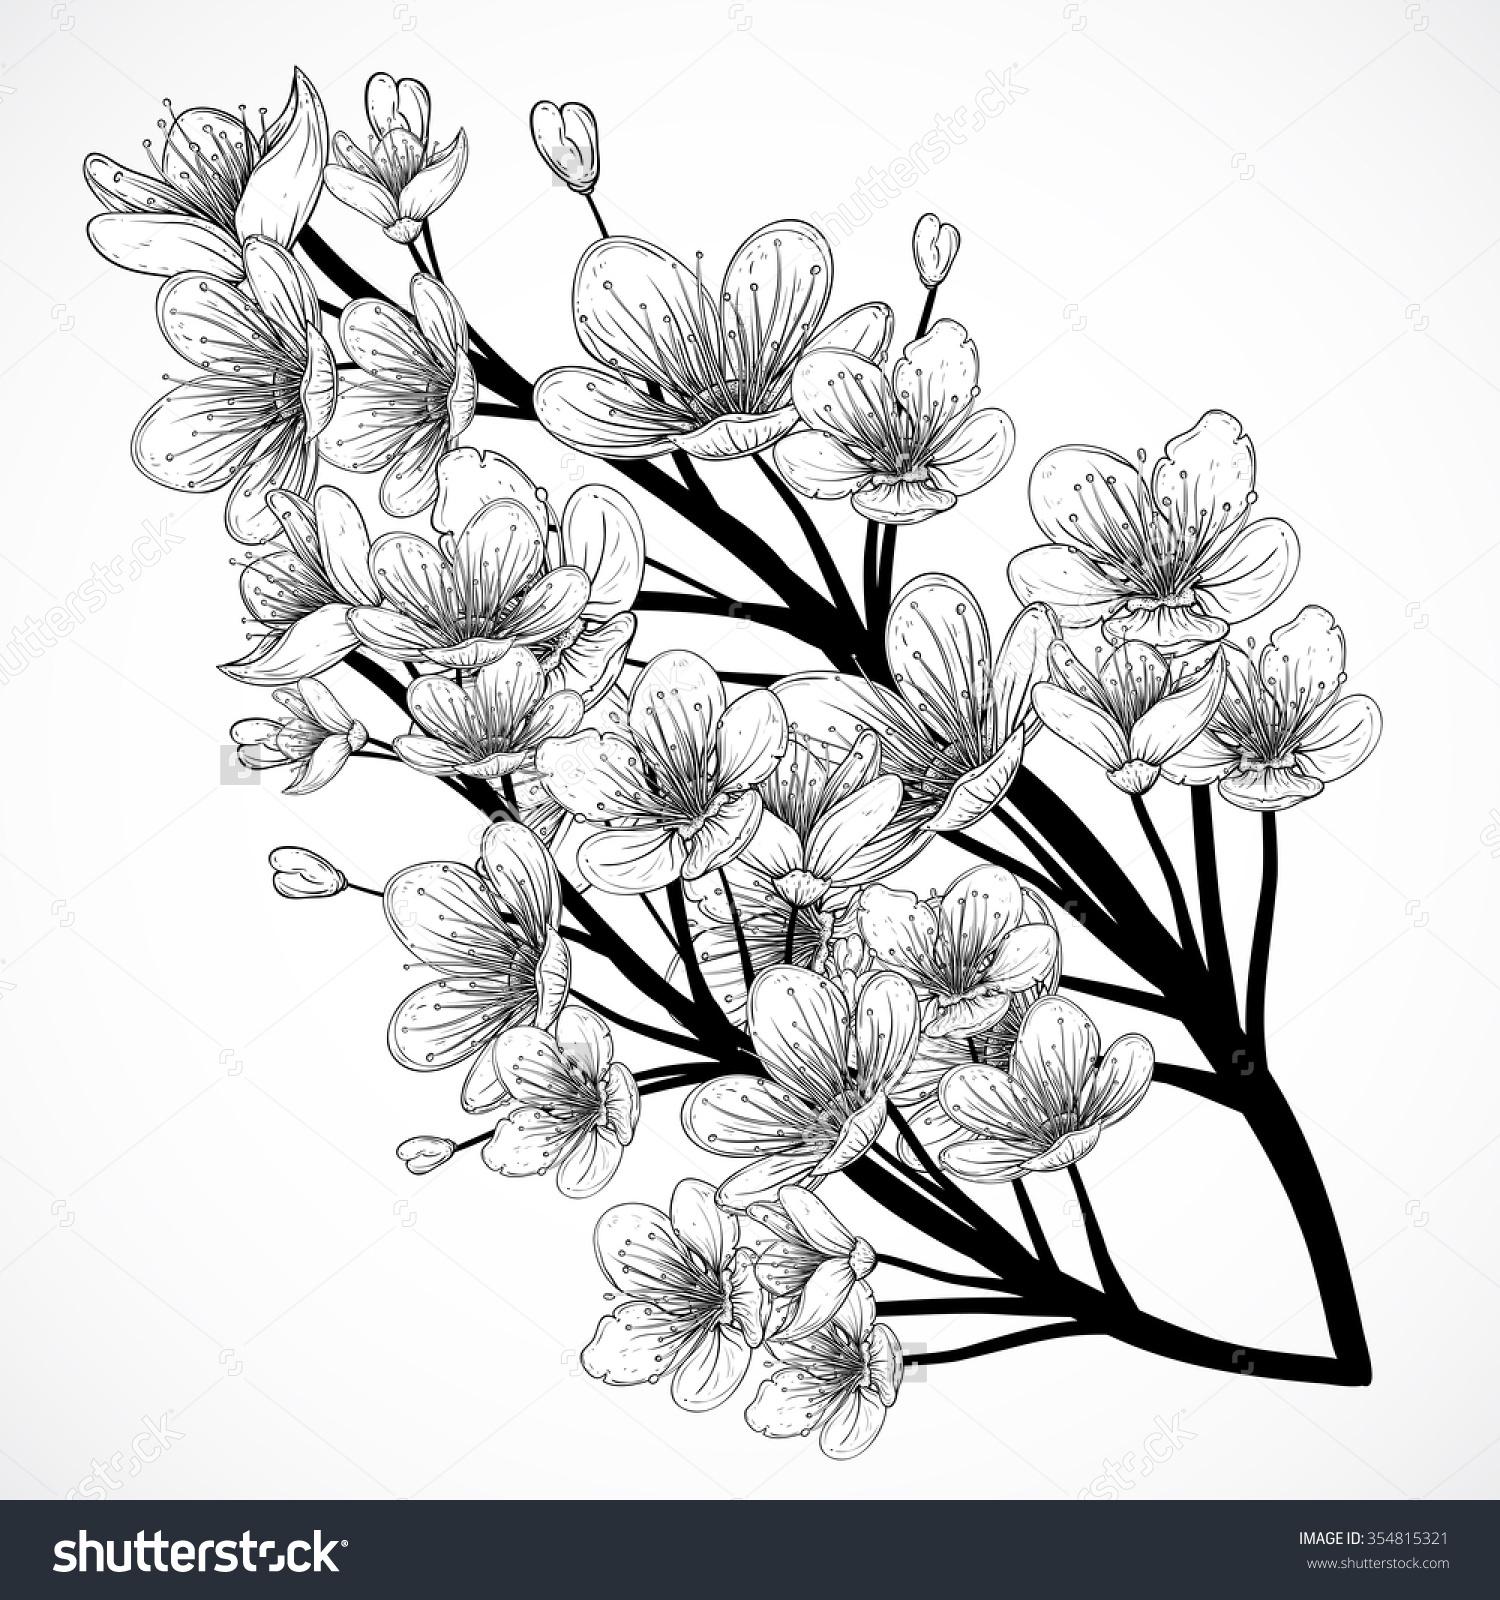 Drawn sakura blossom hand drawn  Art vector hand Pin